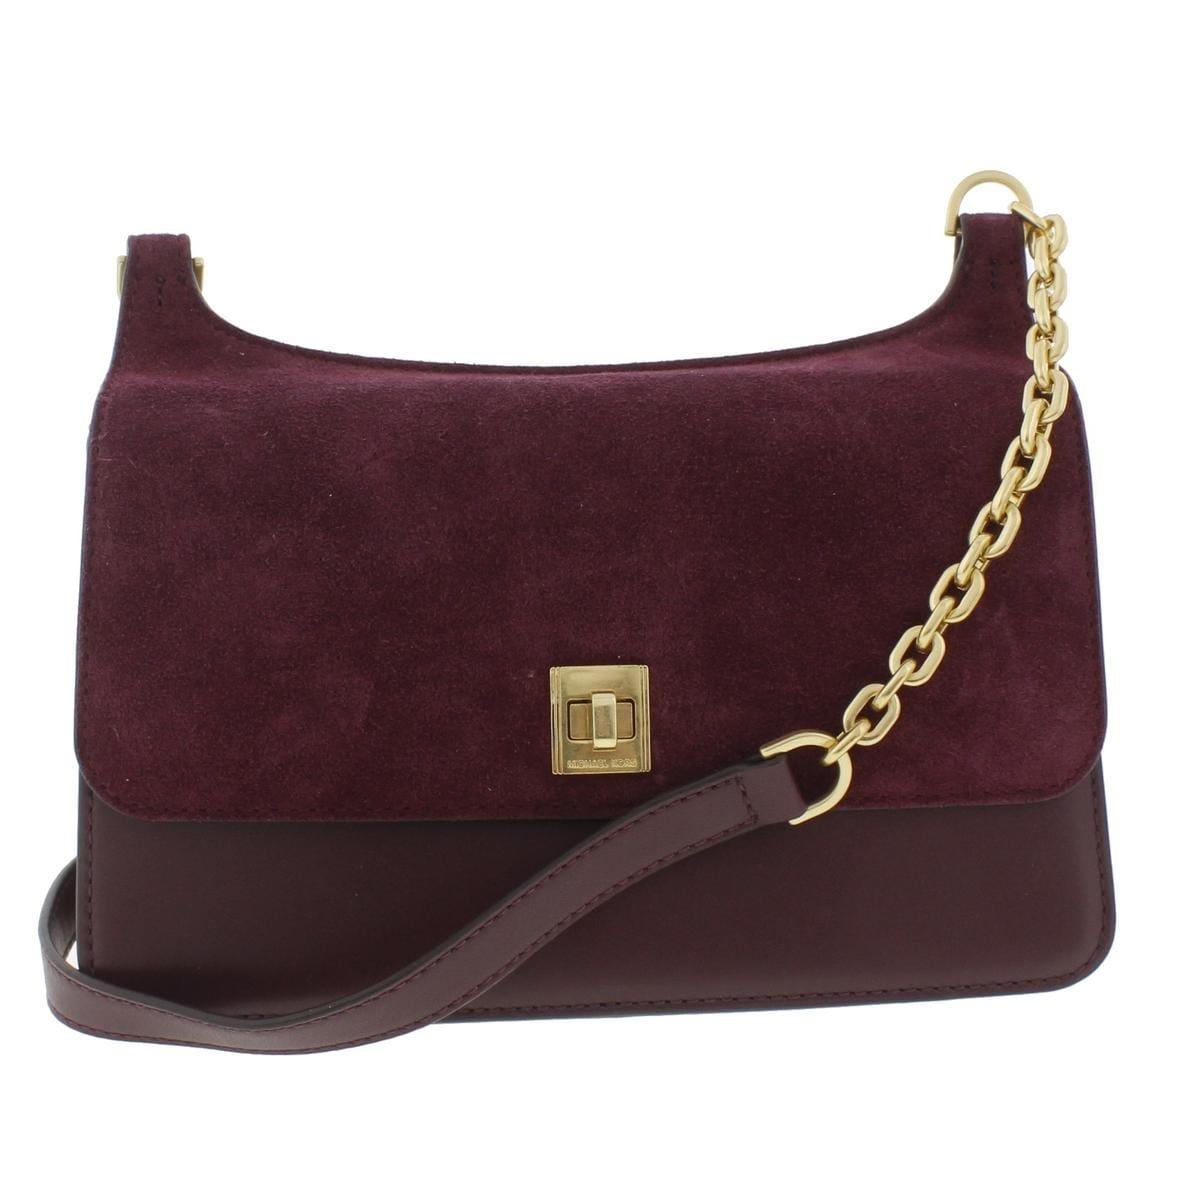 ac5e5f8cdb4 MICHAEL Michael Kors Womens Natalie Messenger Handbag Suede Crossbody -  small